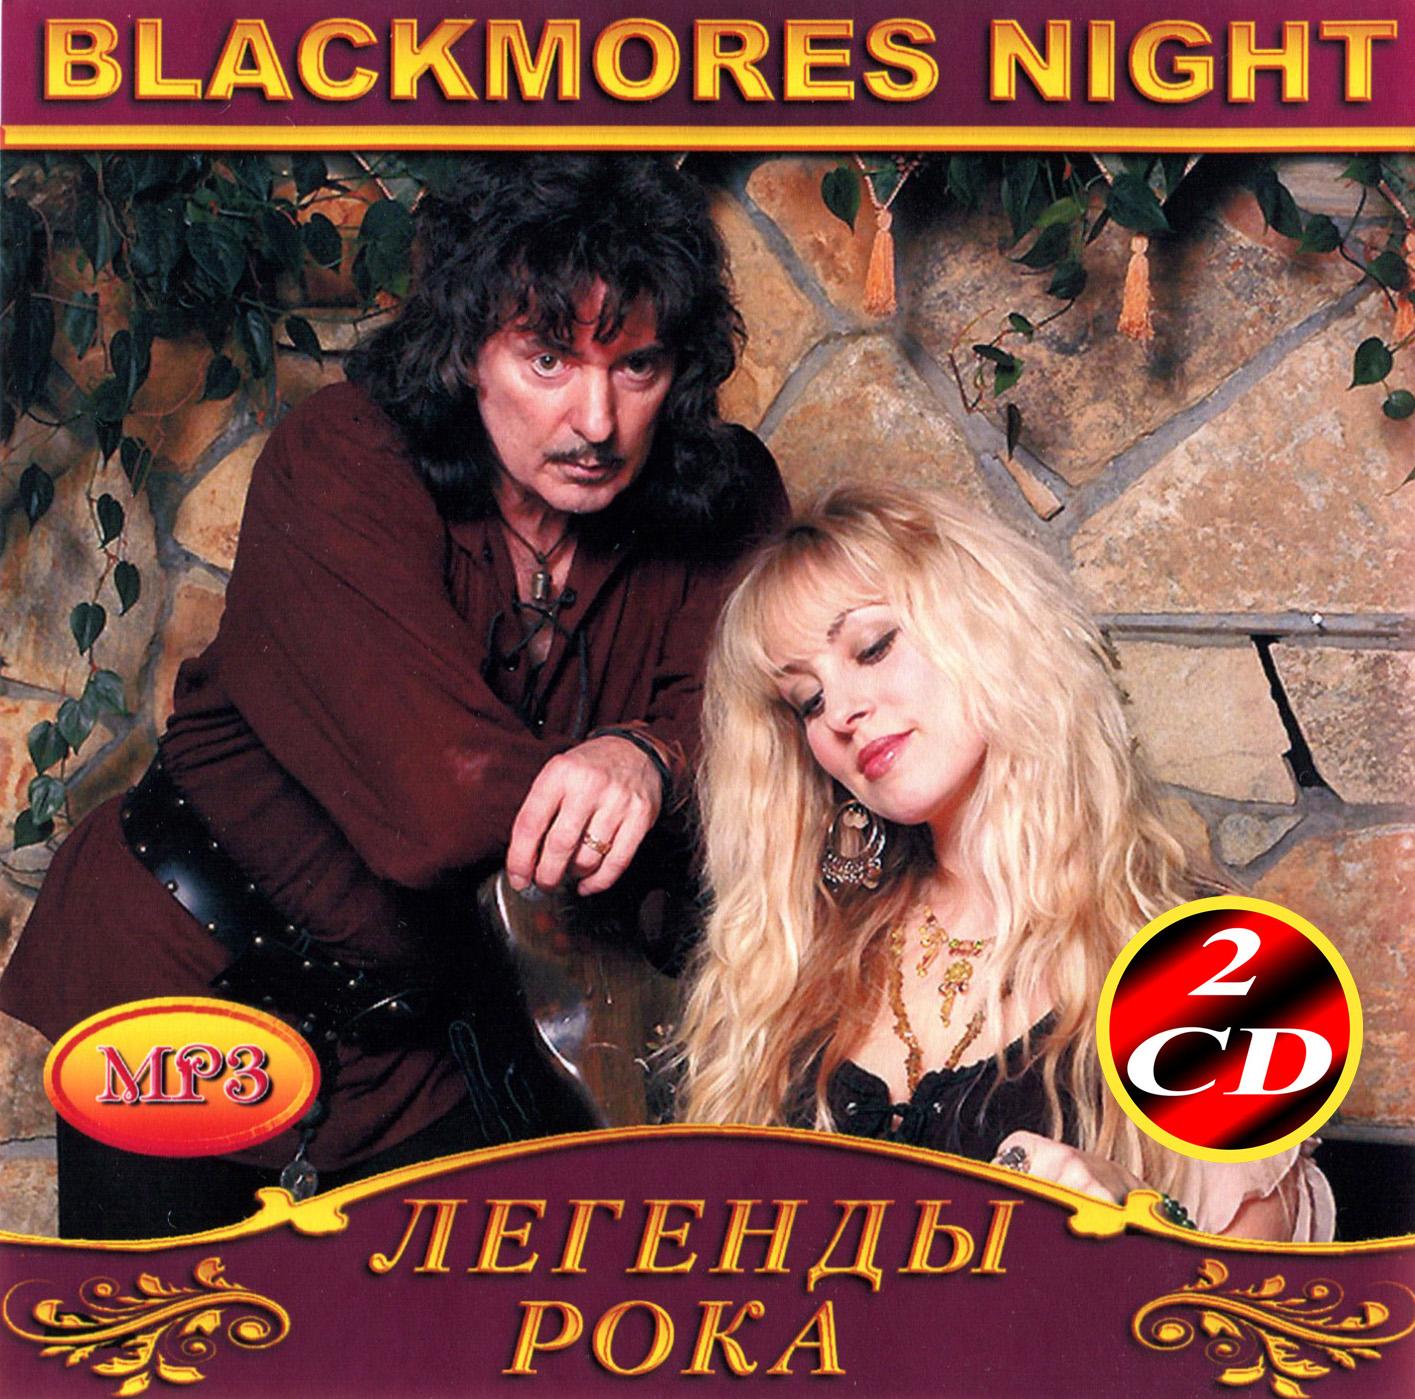 Blackmore's Night 2cd [mp3]